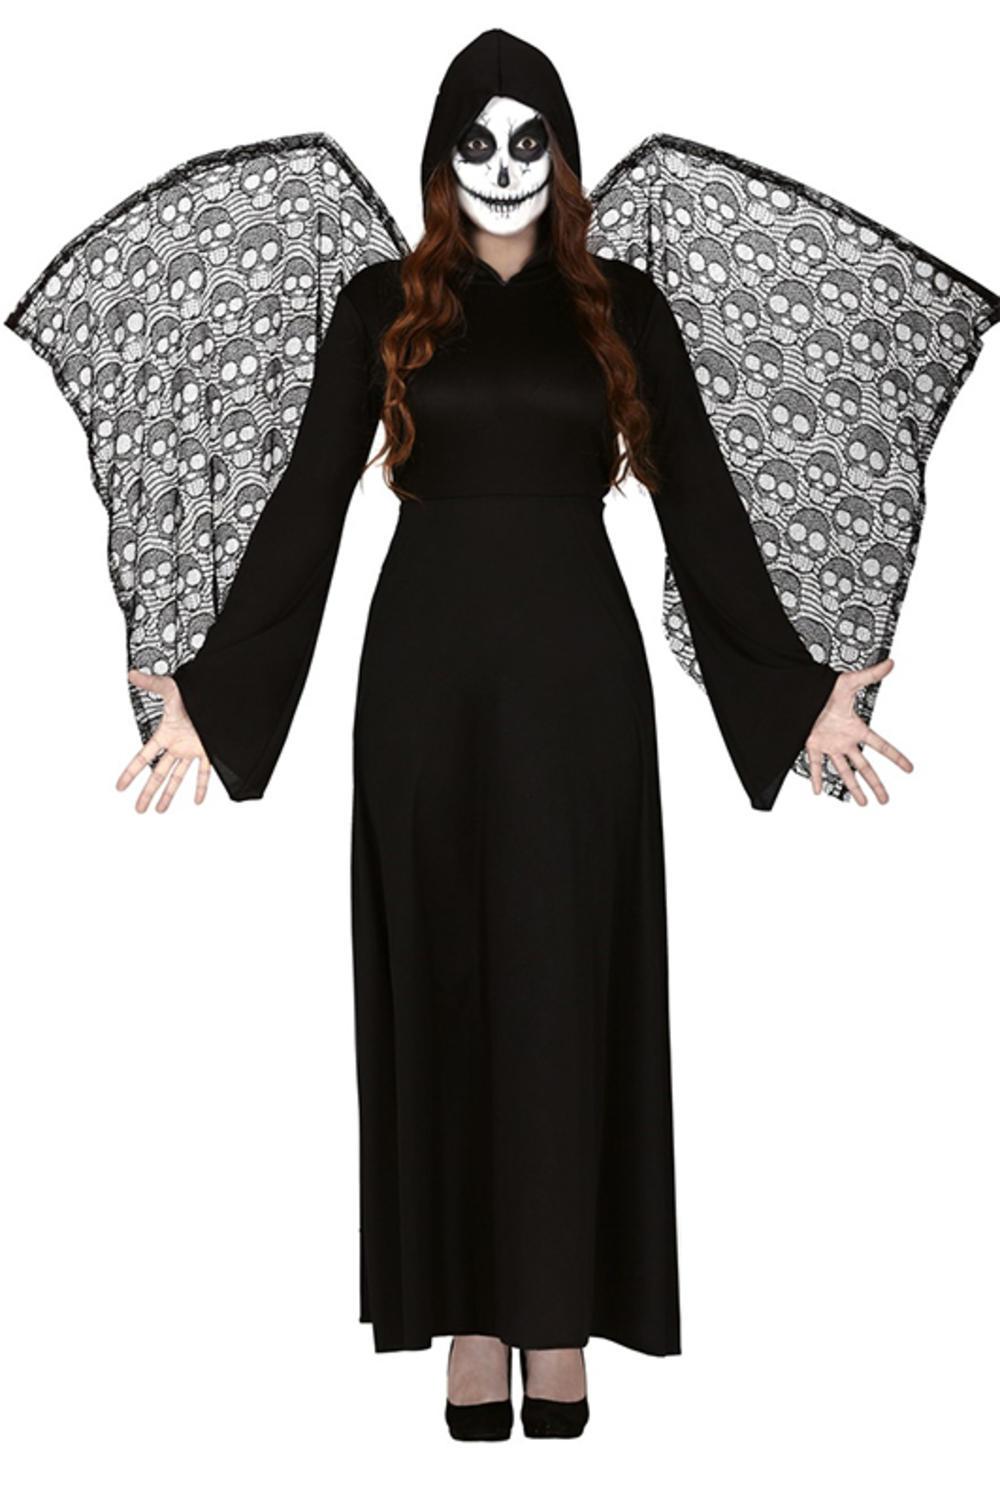 Ladies Winged Death Reaper Costume